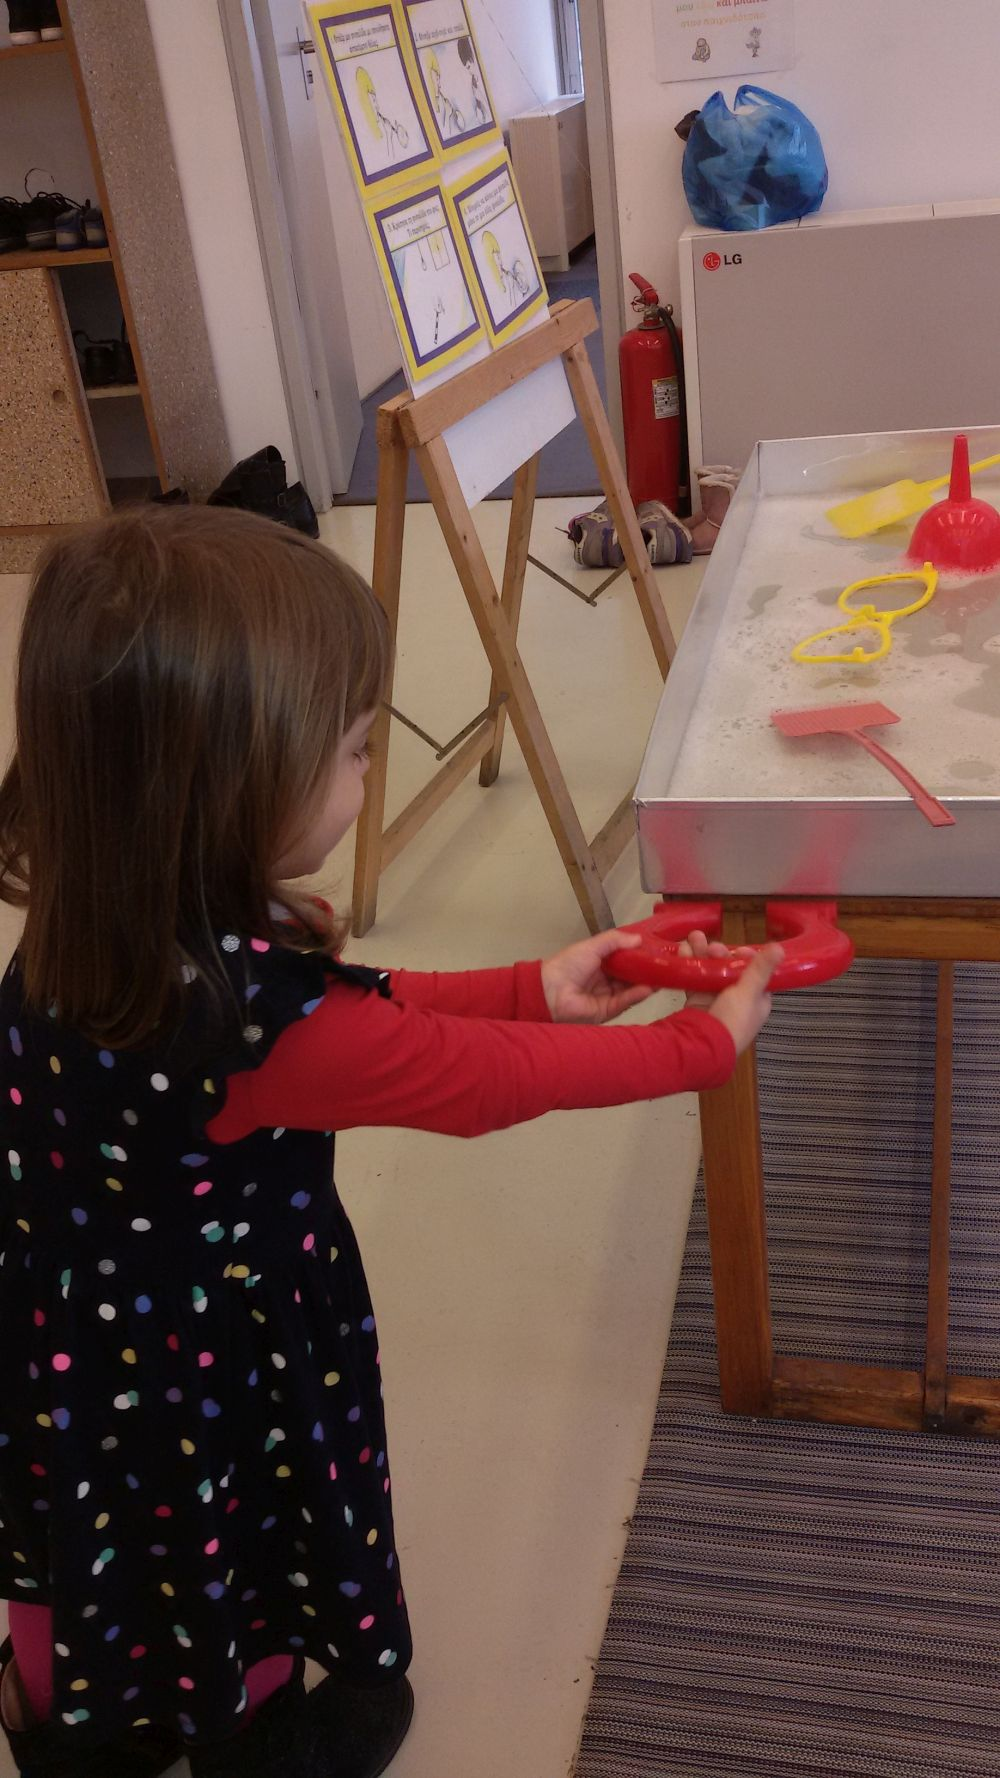 CHILDREN'S MUSEUM OF ATHENS 2